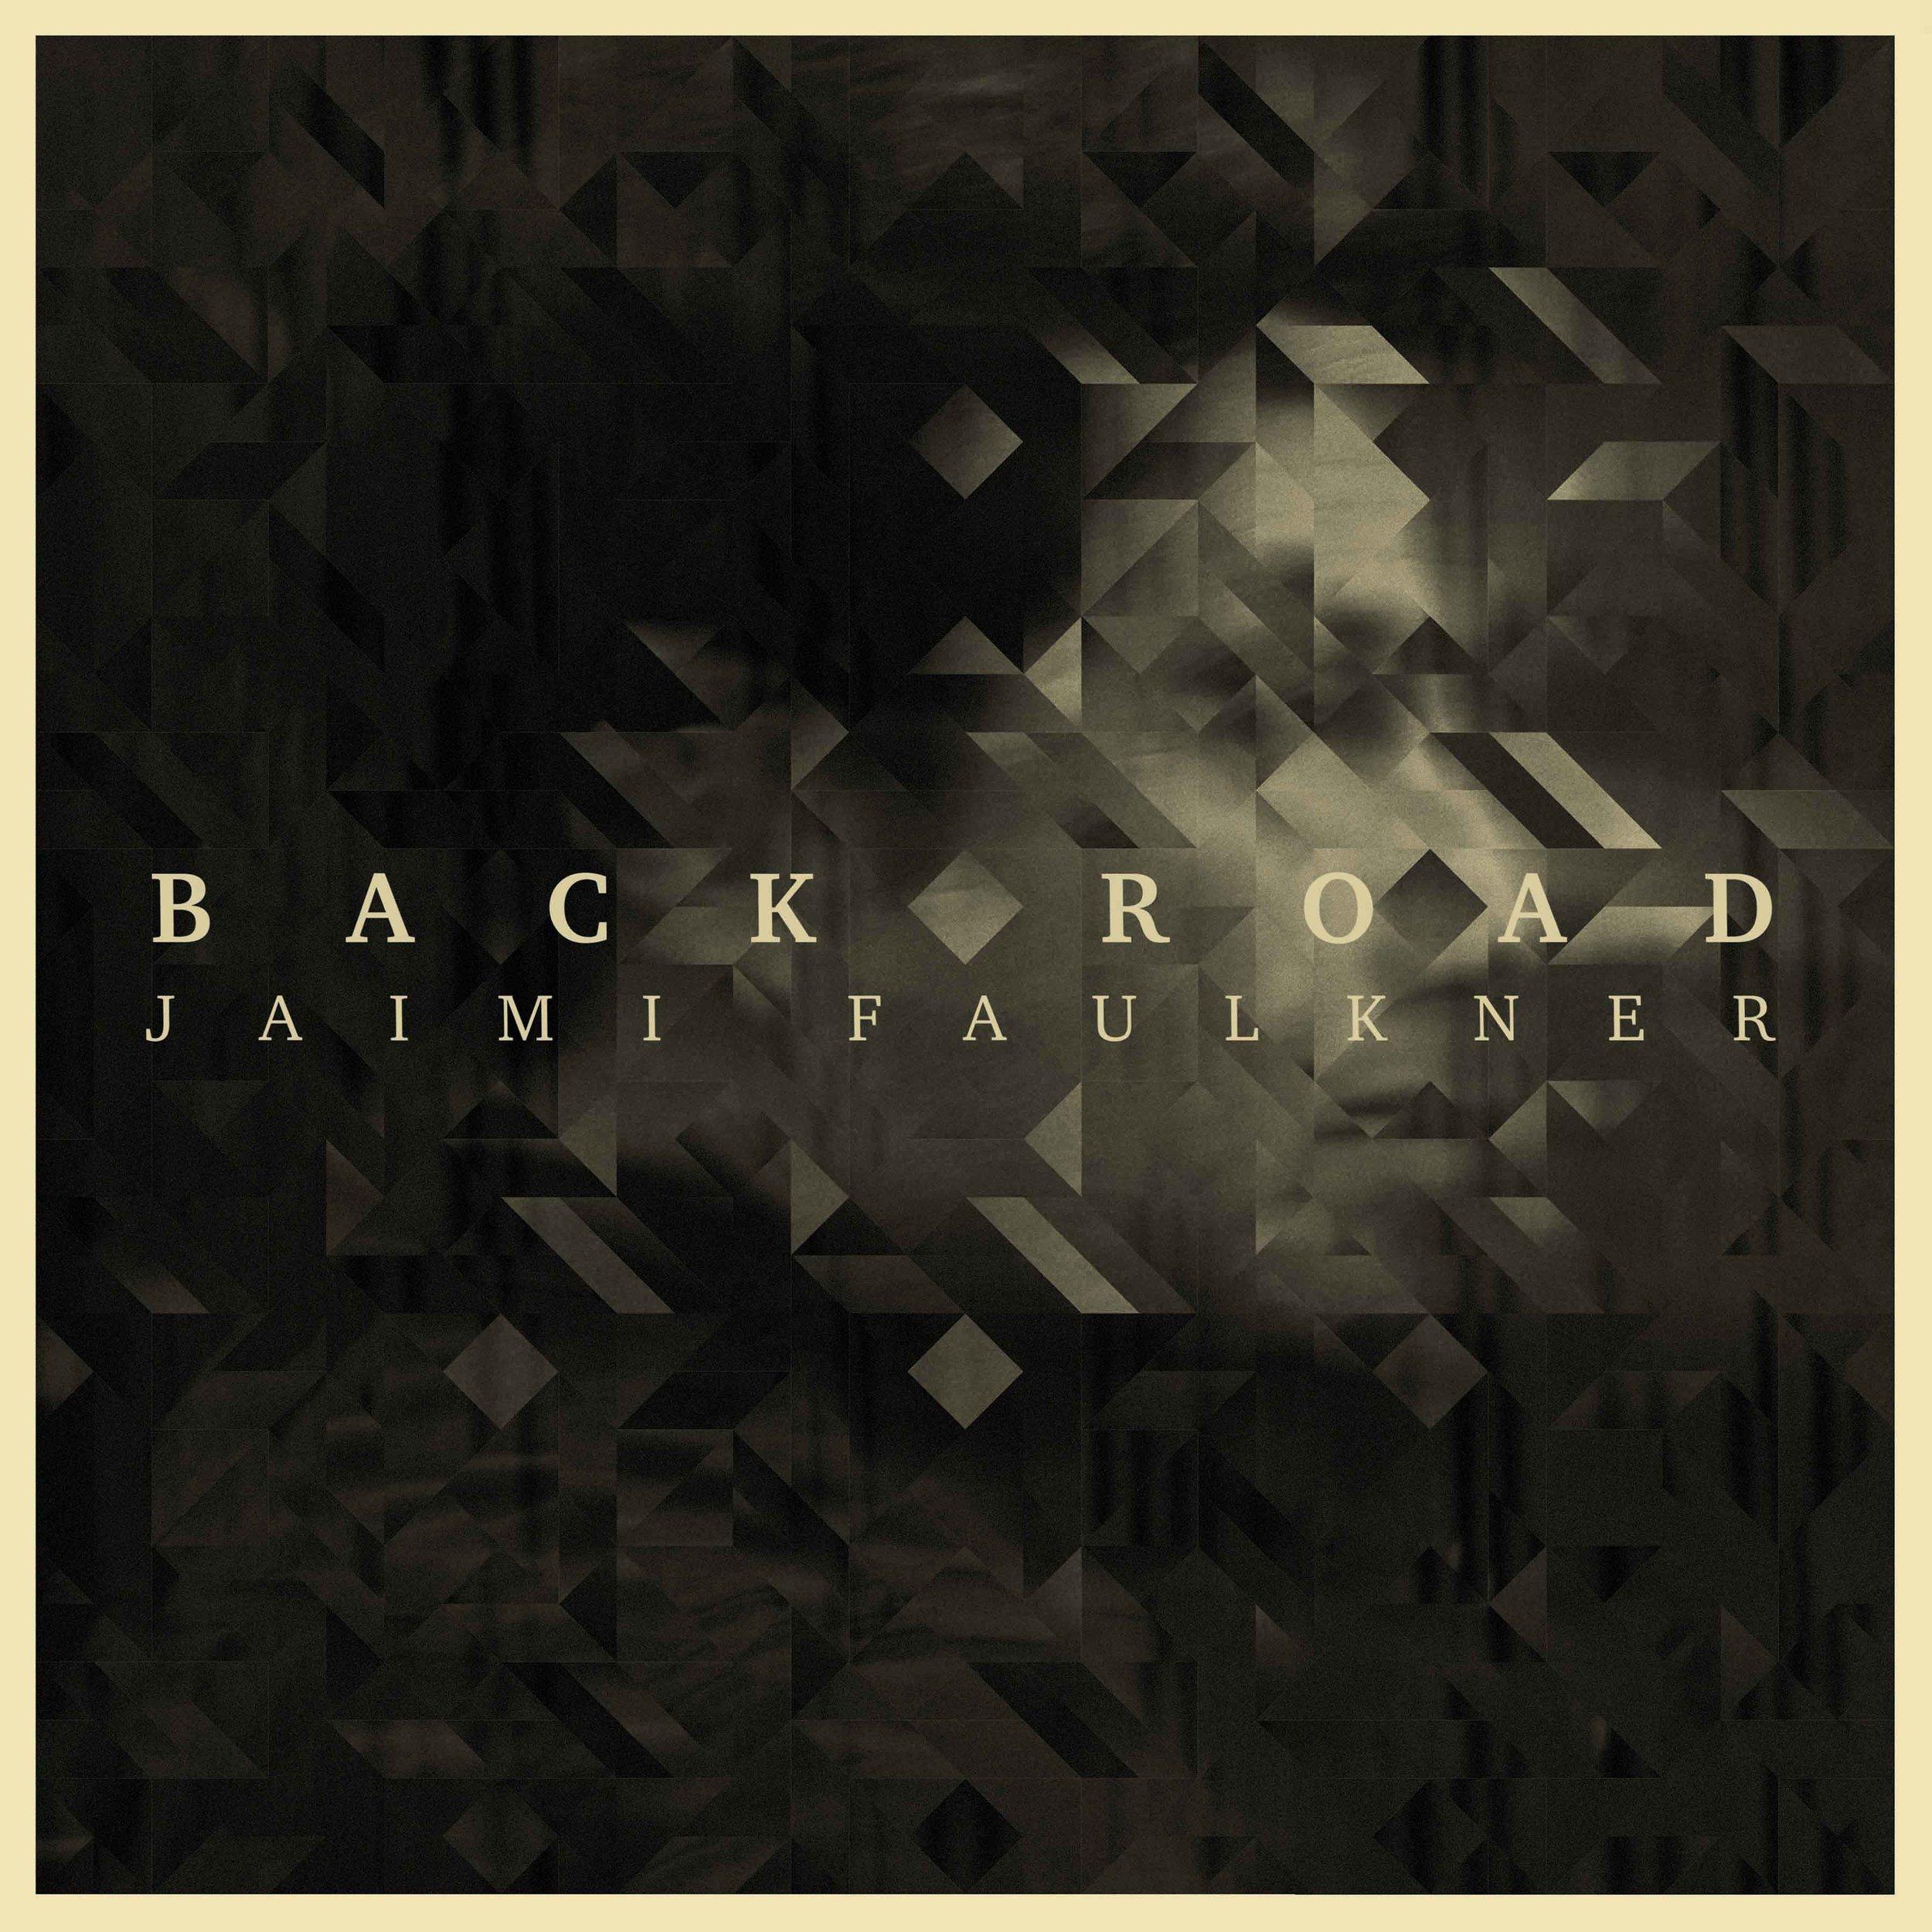 Jaimi Faulkner - 'Back Road' Album Cover